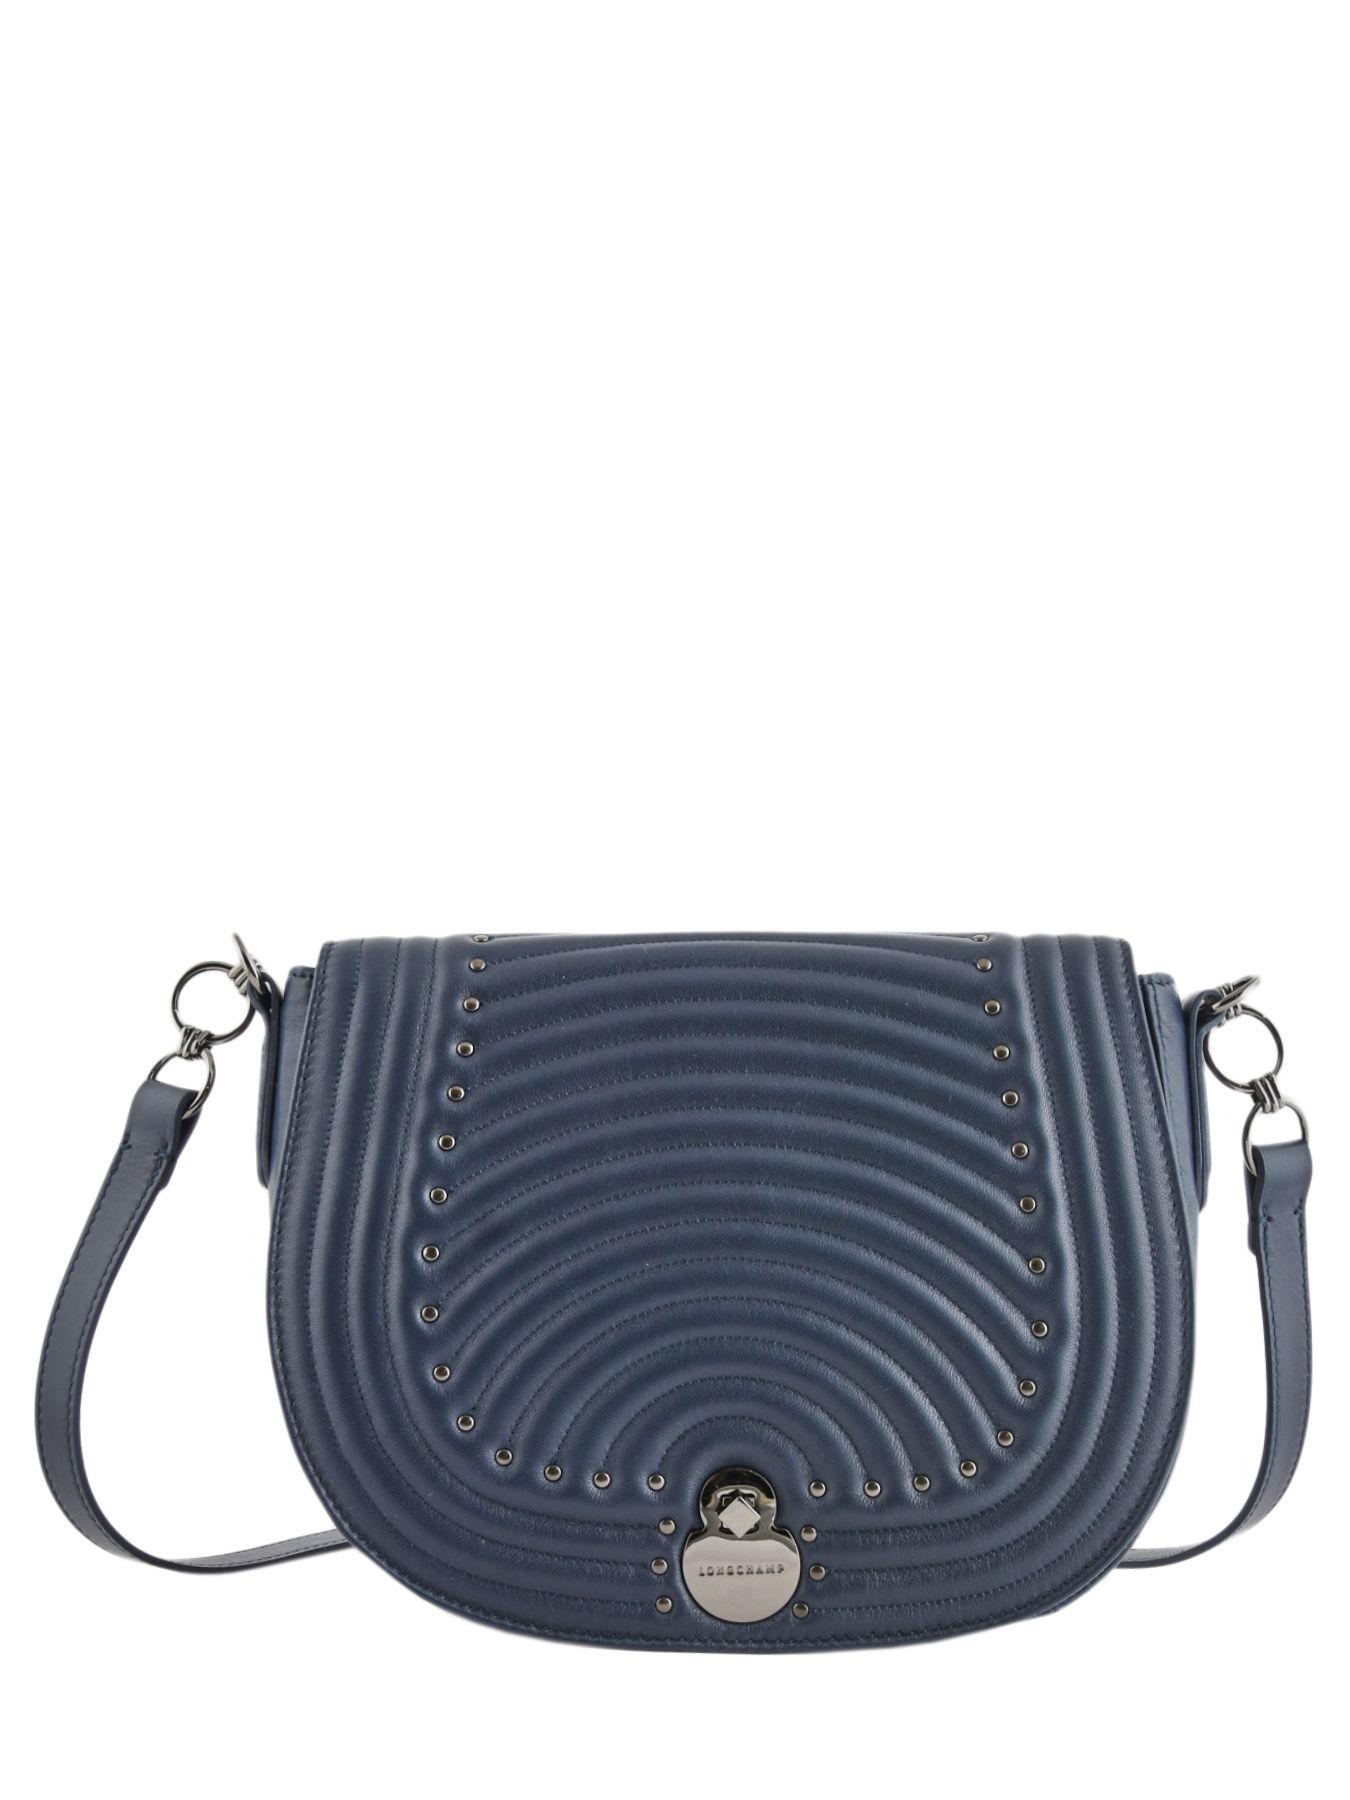 a772985c7 ... Longchamp Cavalcade matelassÉ Messenger bag Blue ...